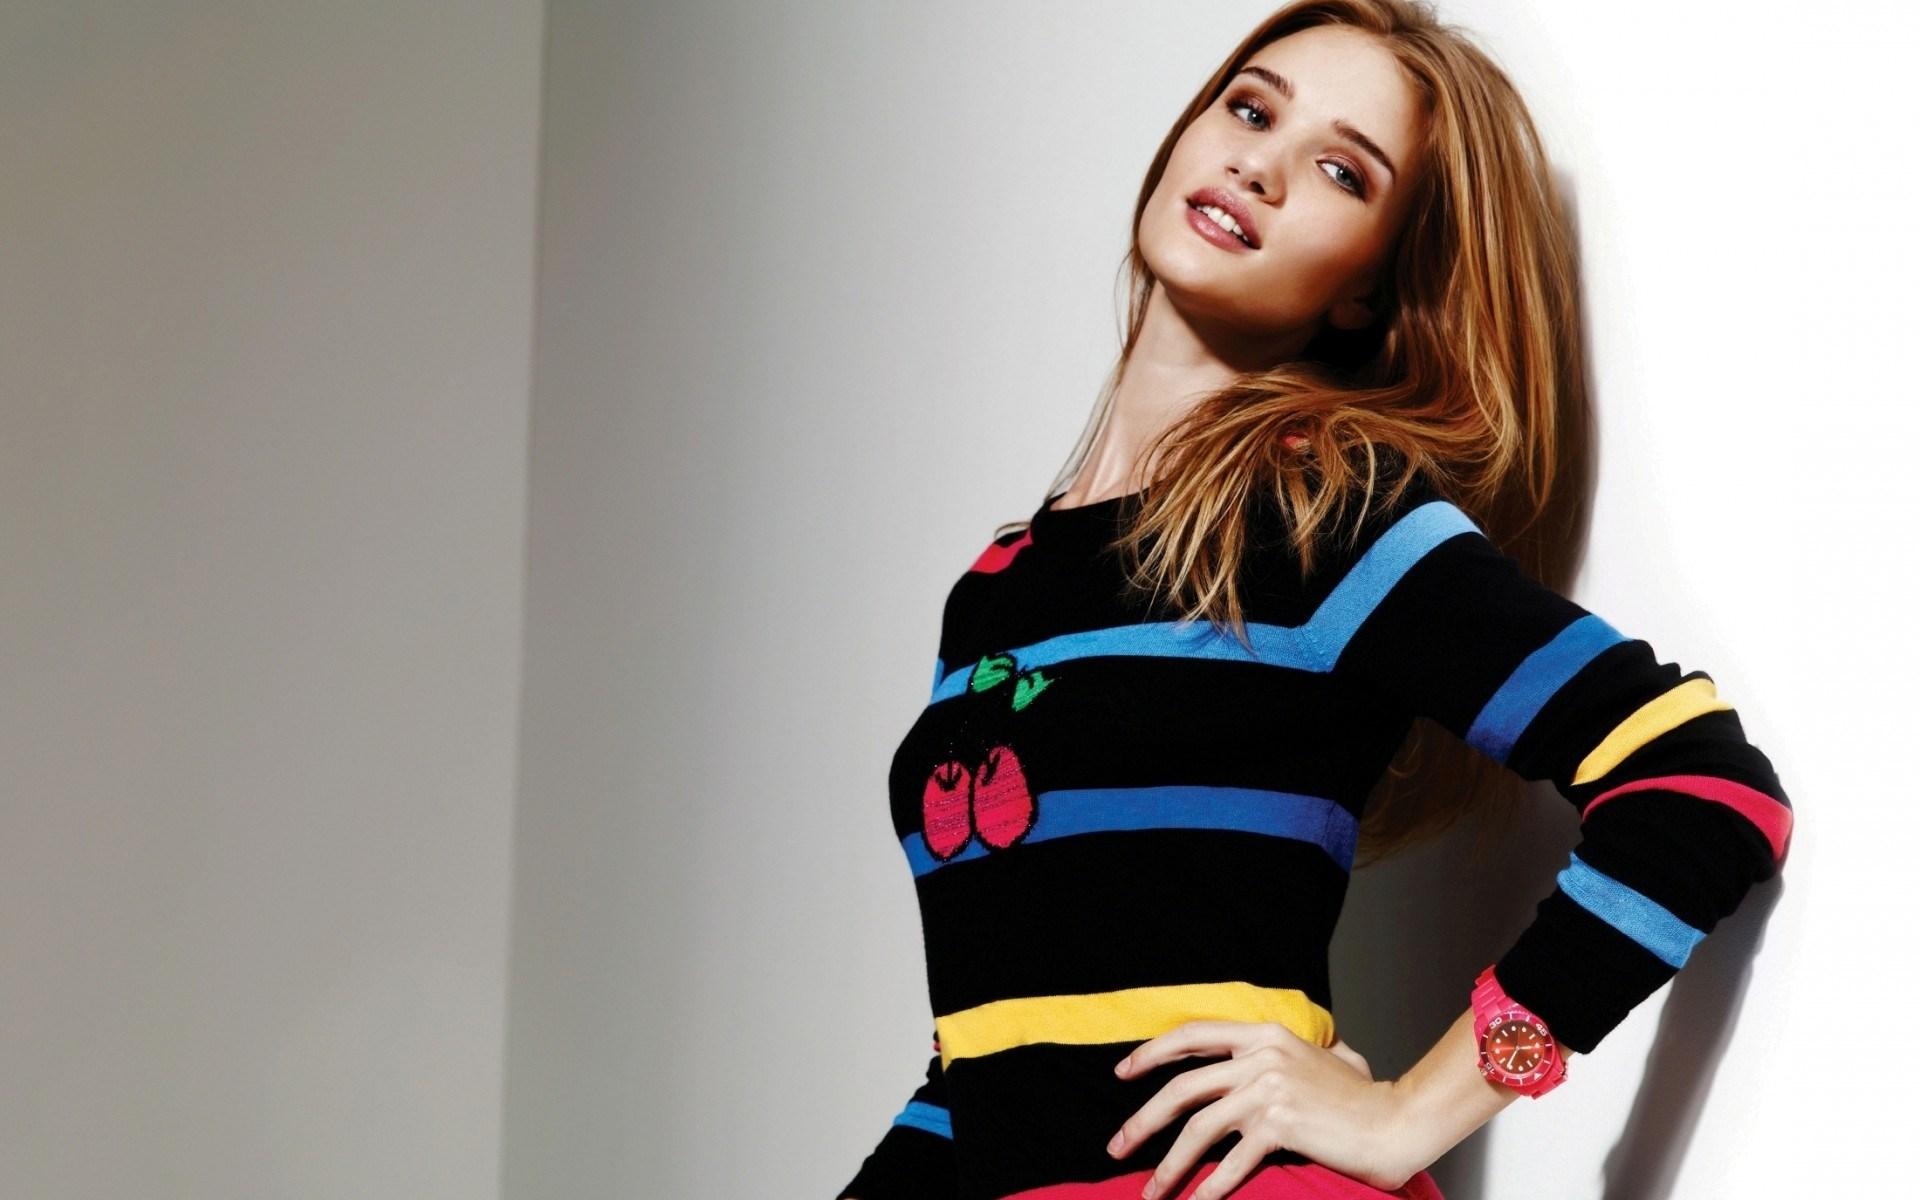 HD Model Girl Wallpapers (15 Wallpapers) – Adorable Wallpapers